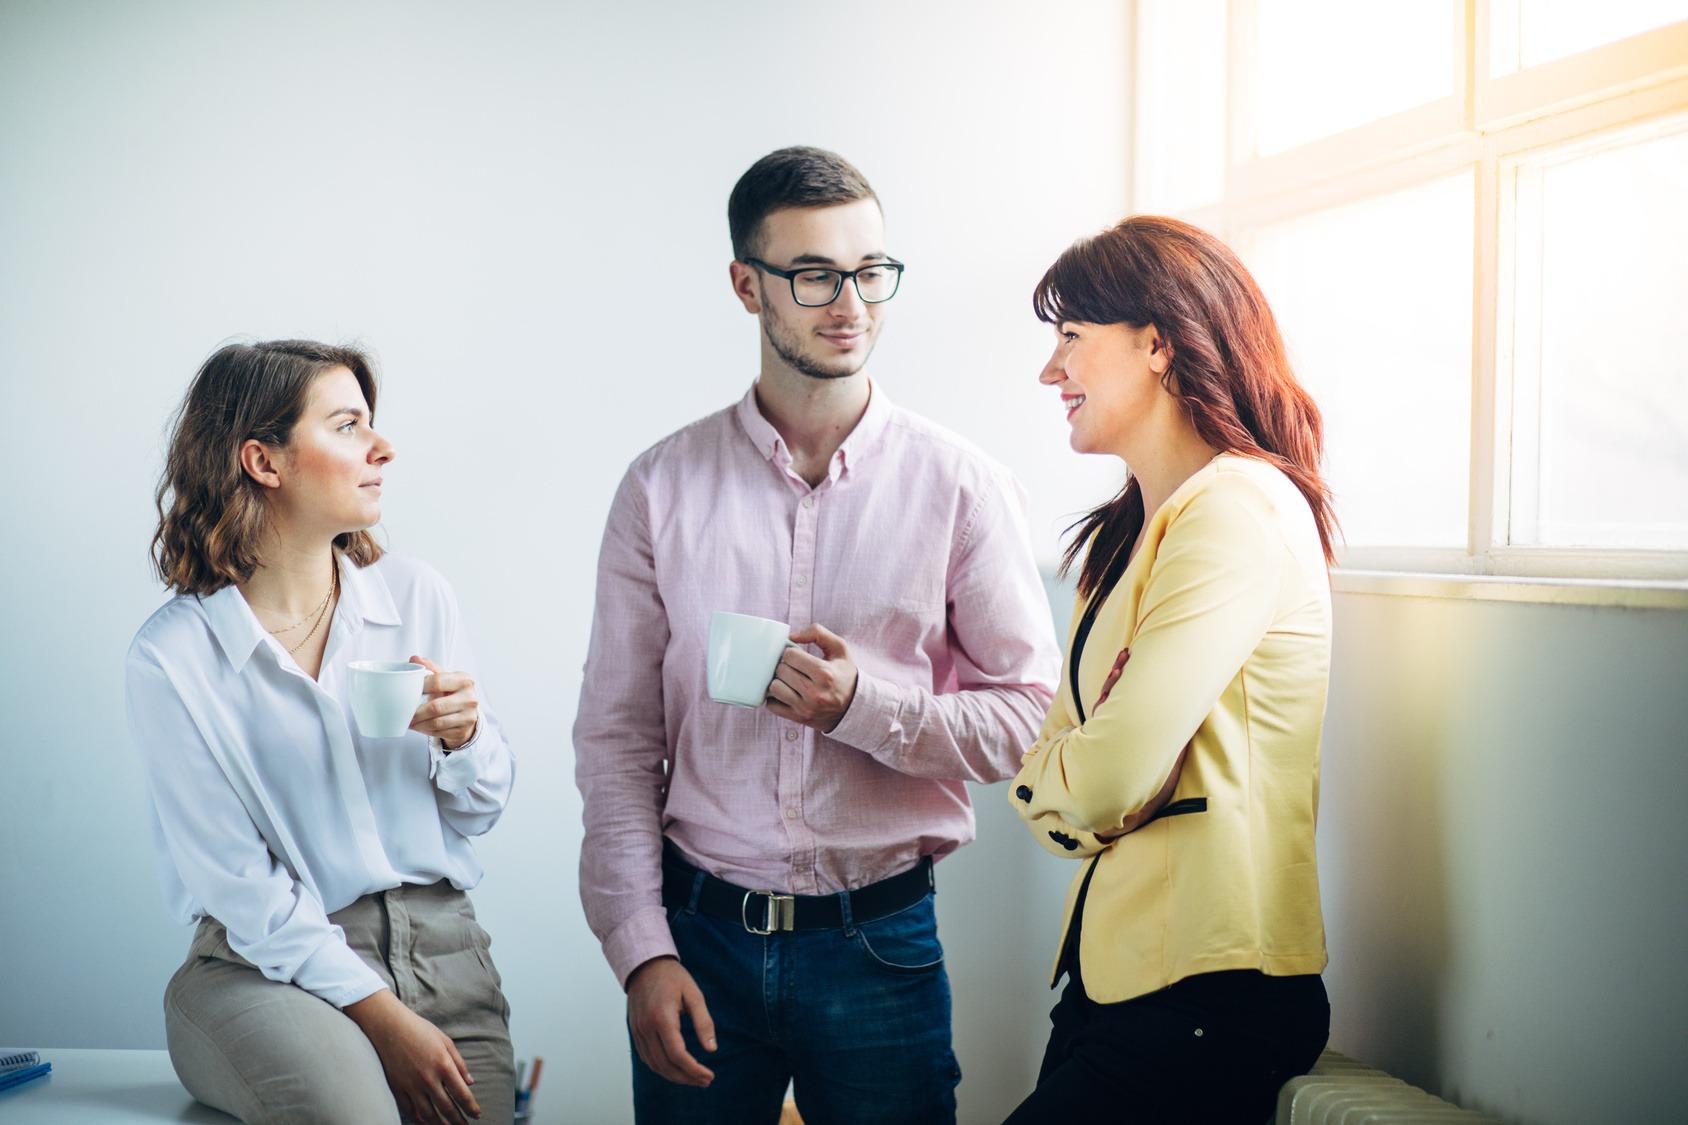 Arbeitskollegen beim Small Talk im Büro